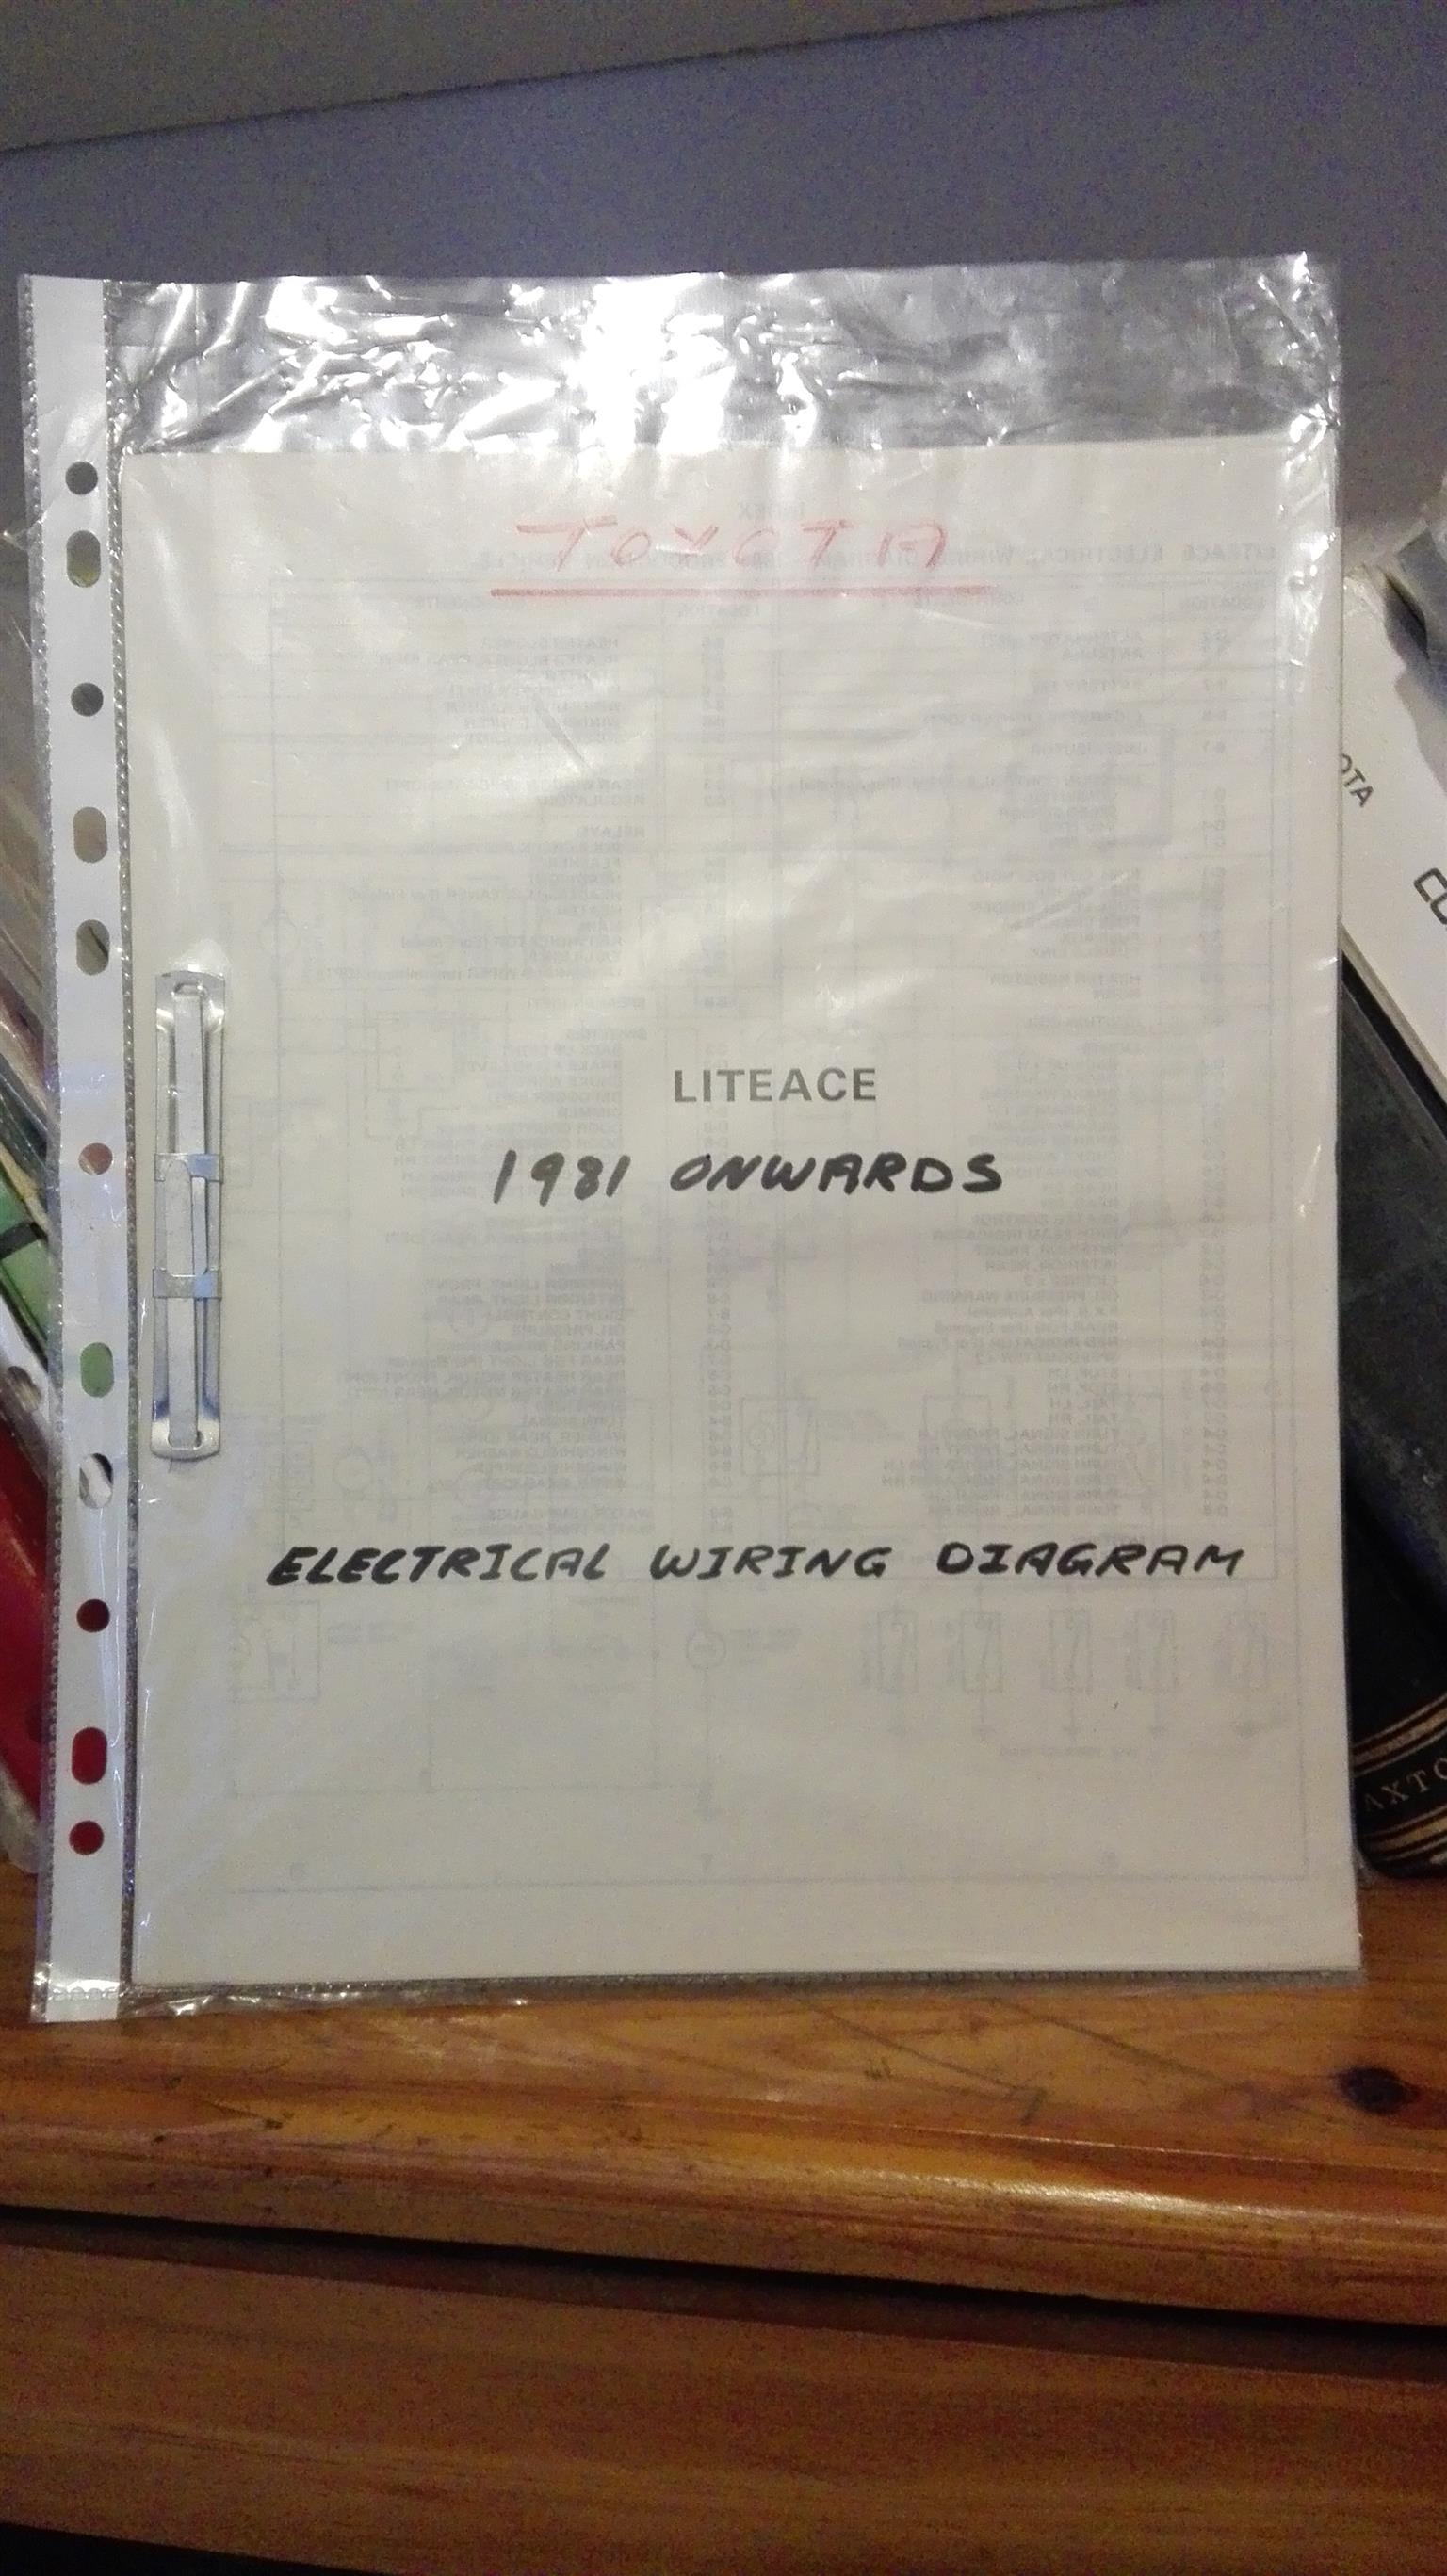 Terrific Lite Ace 1981 82 Electrical Wiring Diagram Junk Mail Wiring Database Gramgelartorg